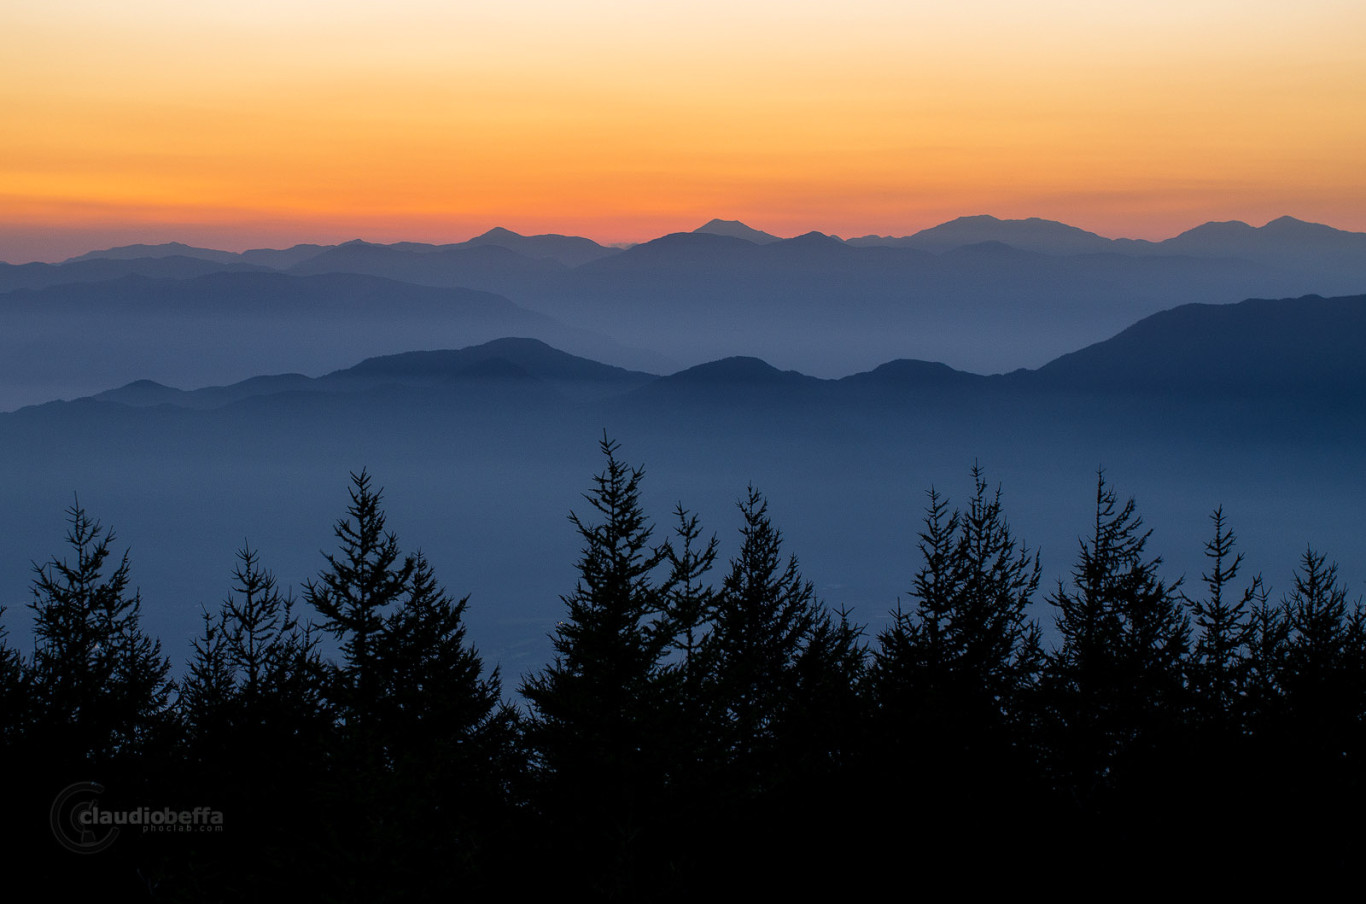 Mount Fuji Blue hour Sunset Mountains Japan